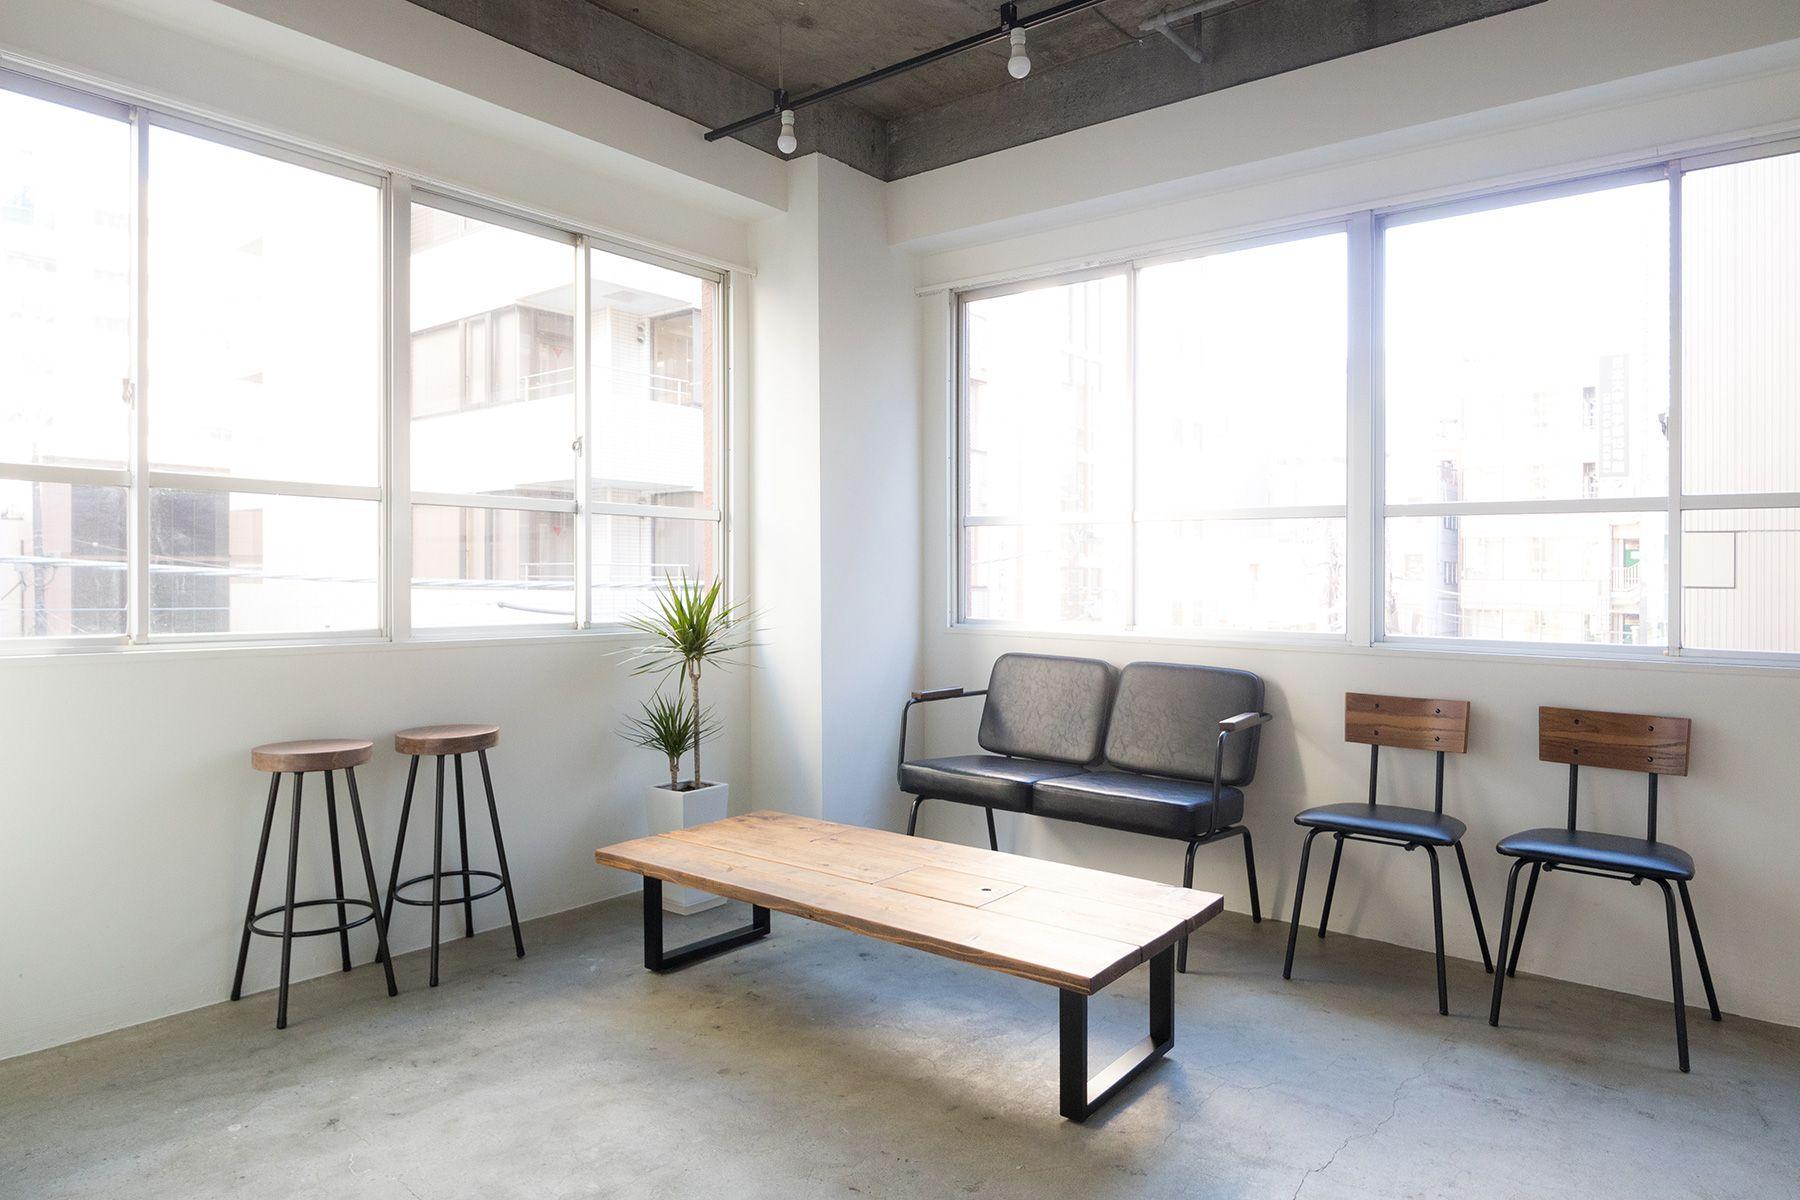 Studio Serato 水道橋 (スタジオセラート水道橋)アンティーク木材のローテーブル